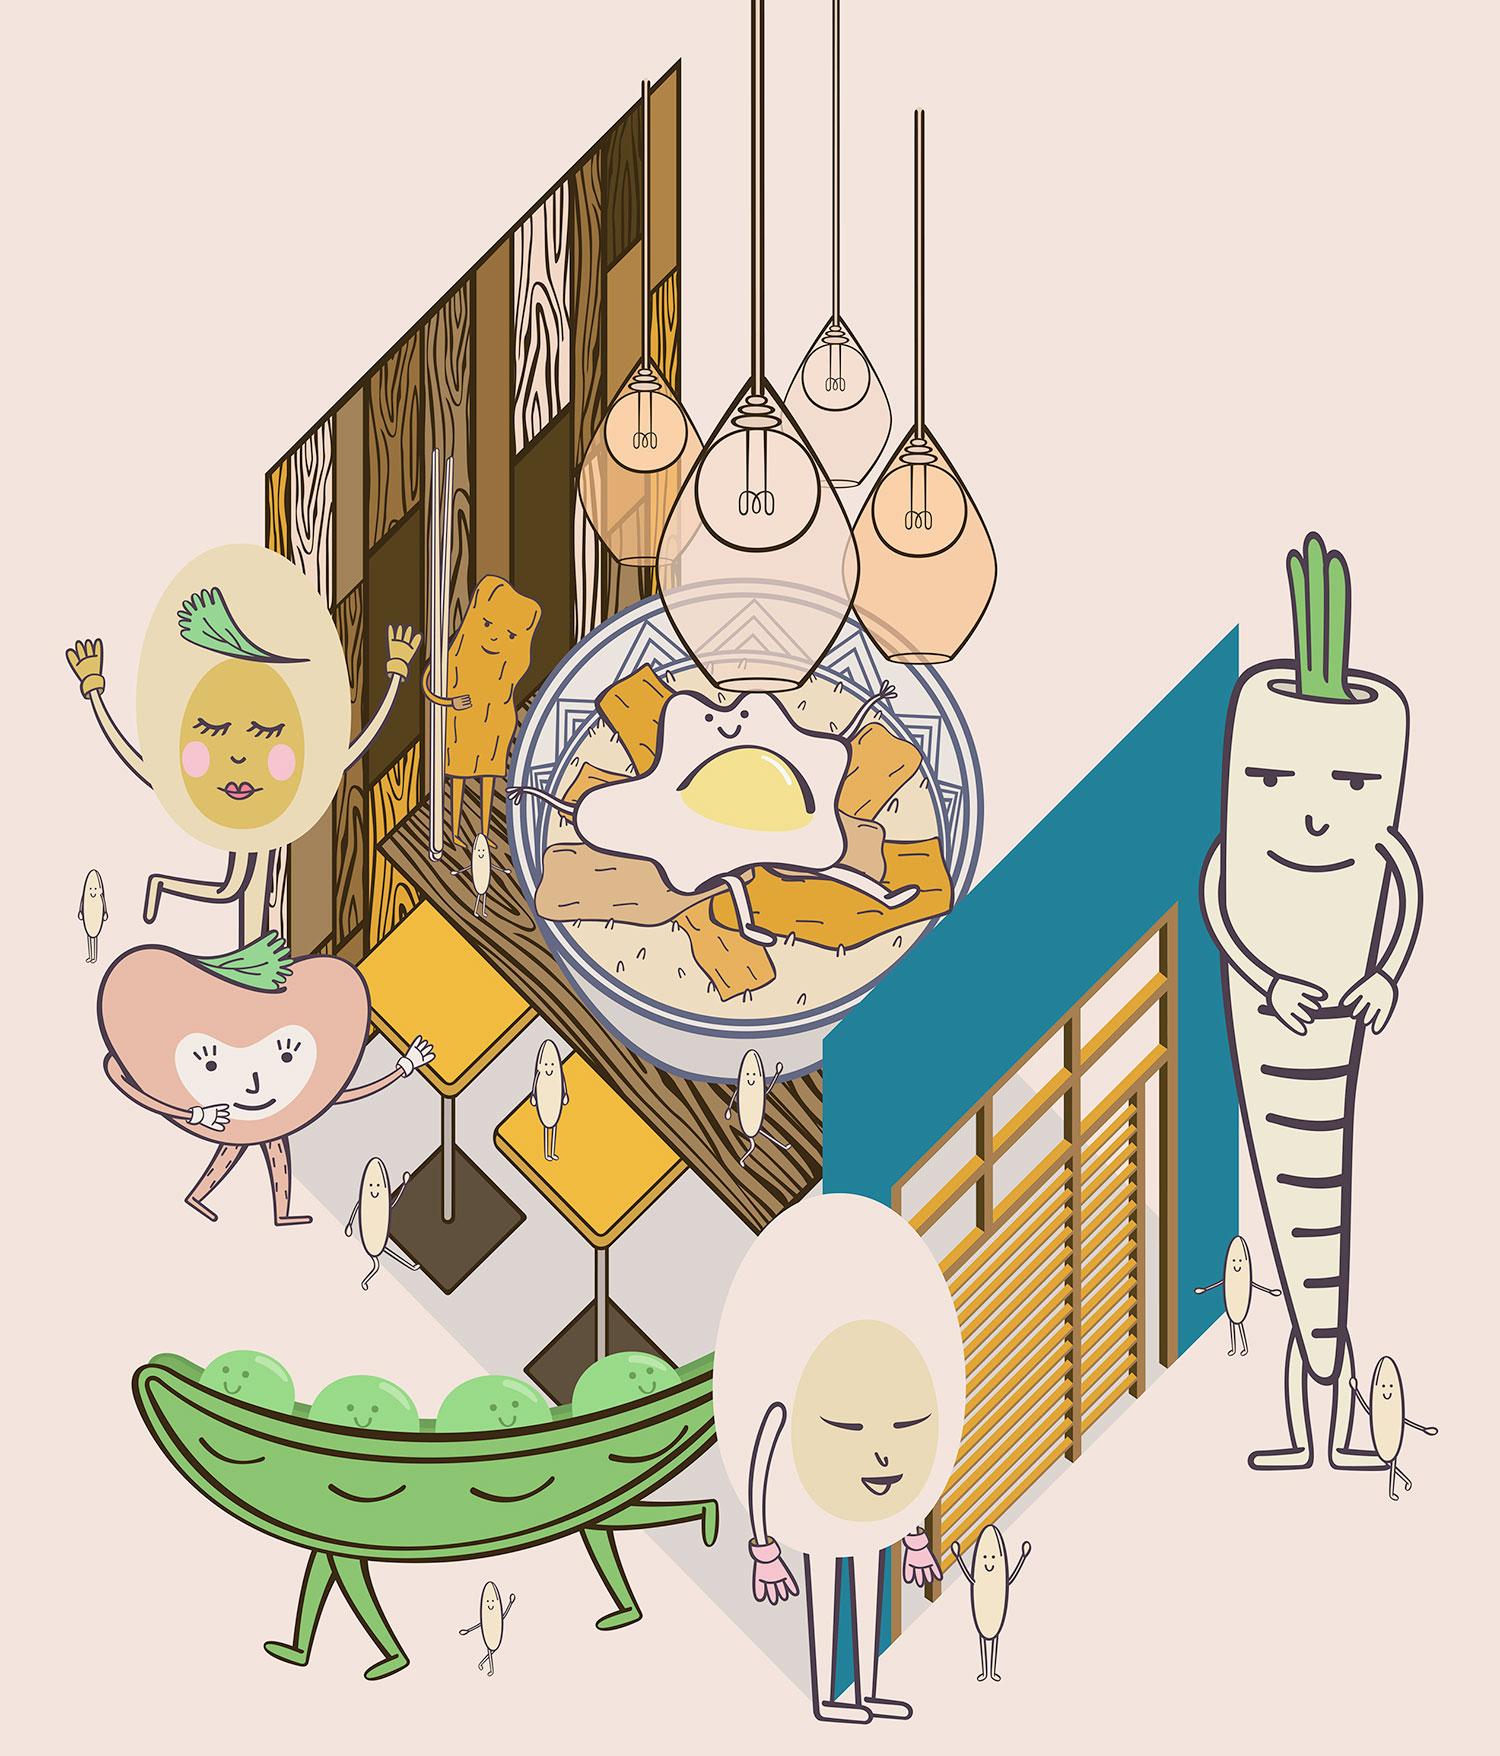 Restaurant Review Illustrated: Oishinoya in Paris.